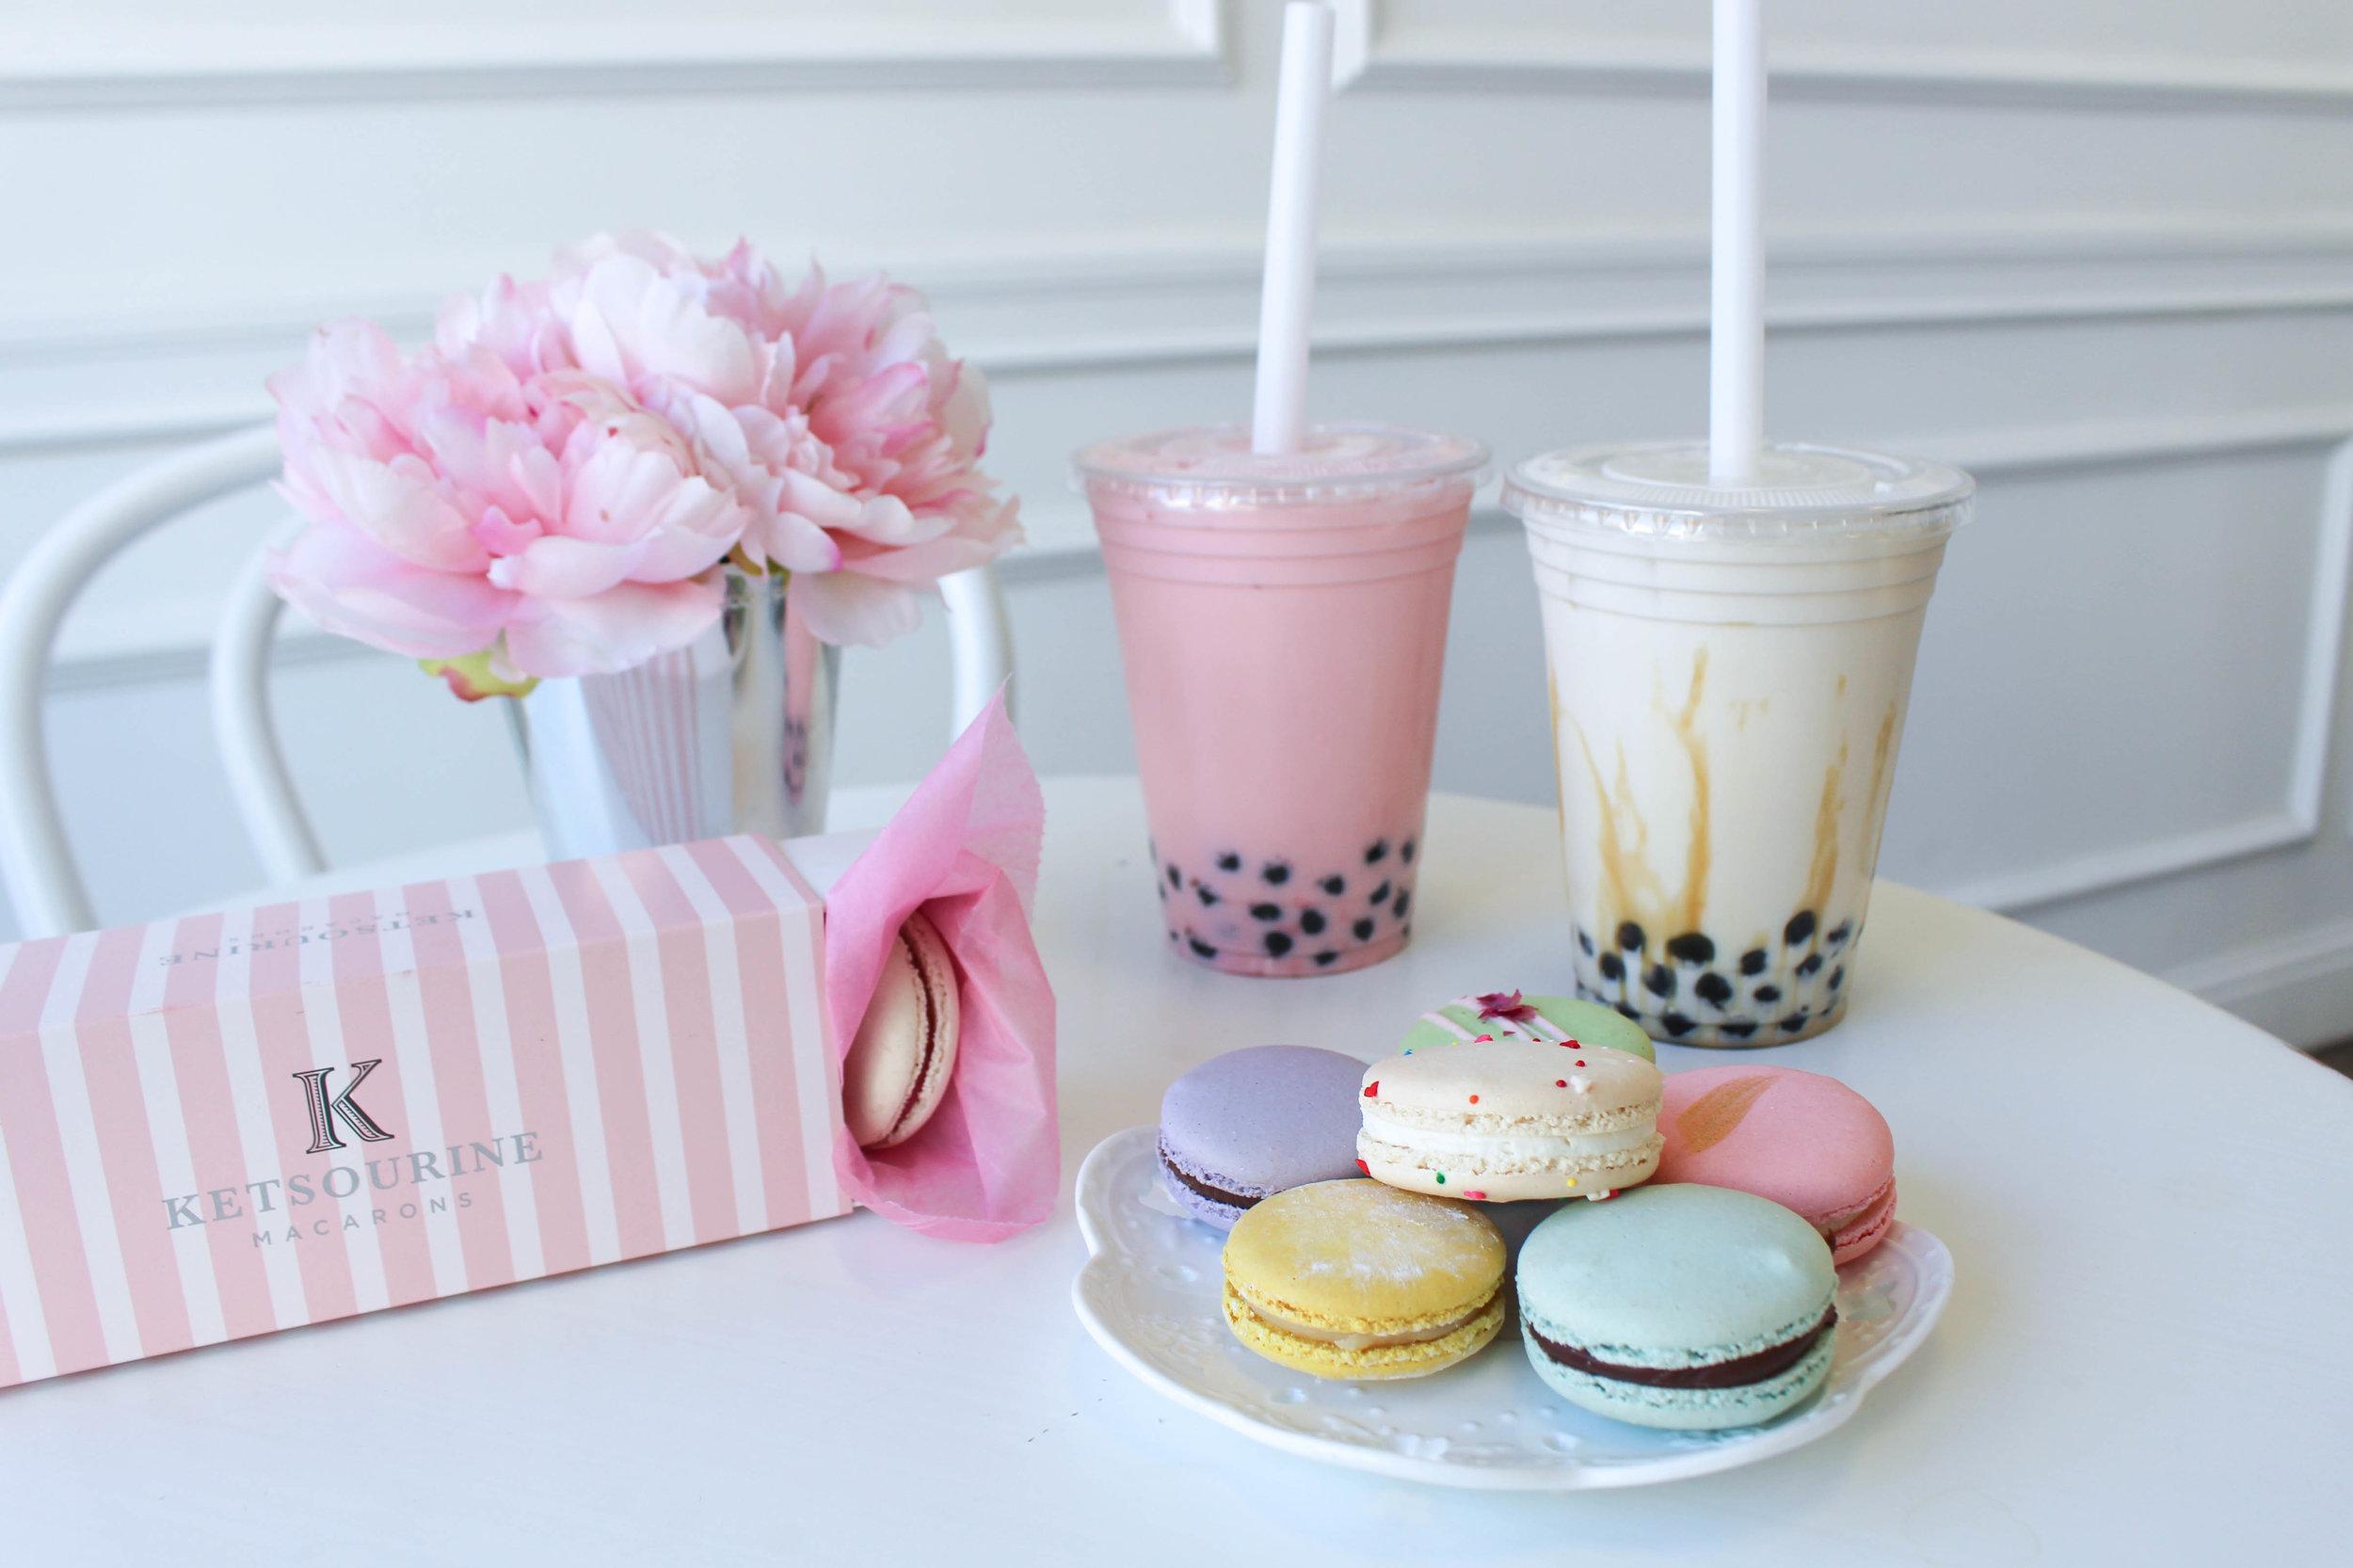 Ketsourine Macarons and bubble tea in San Francisco